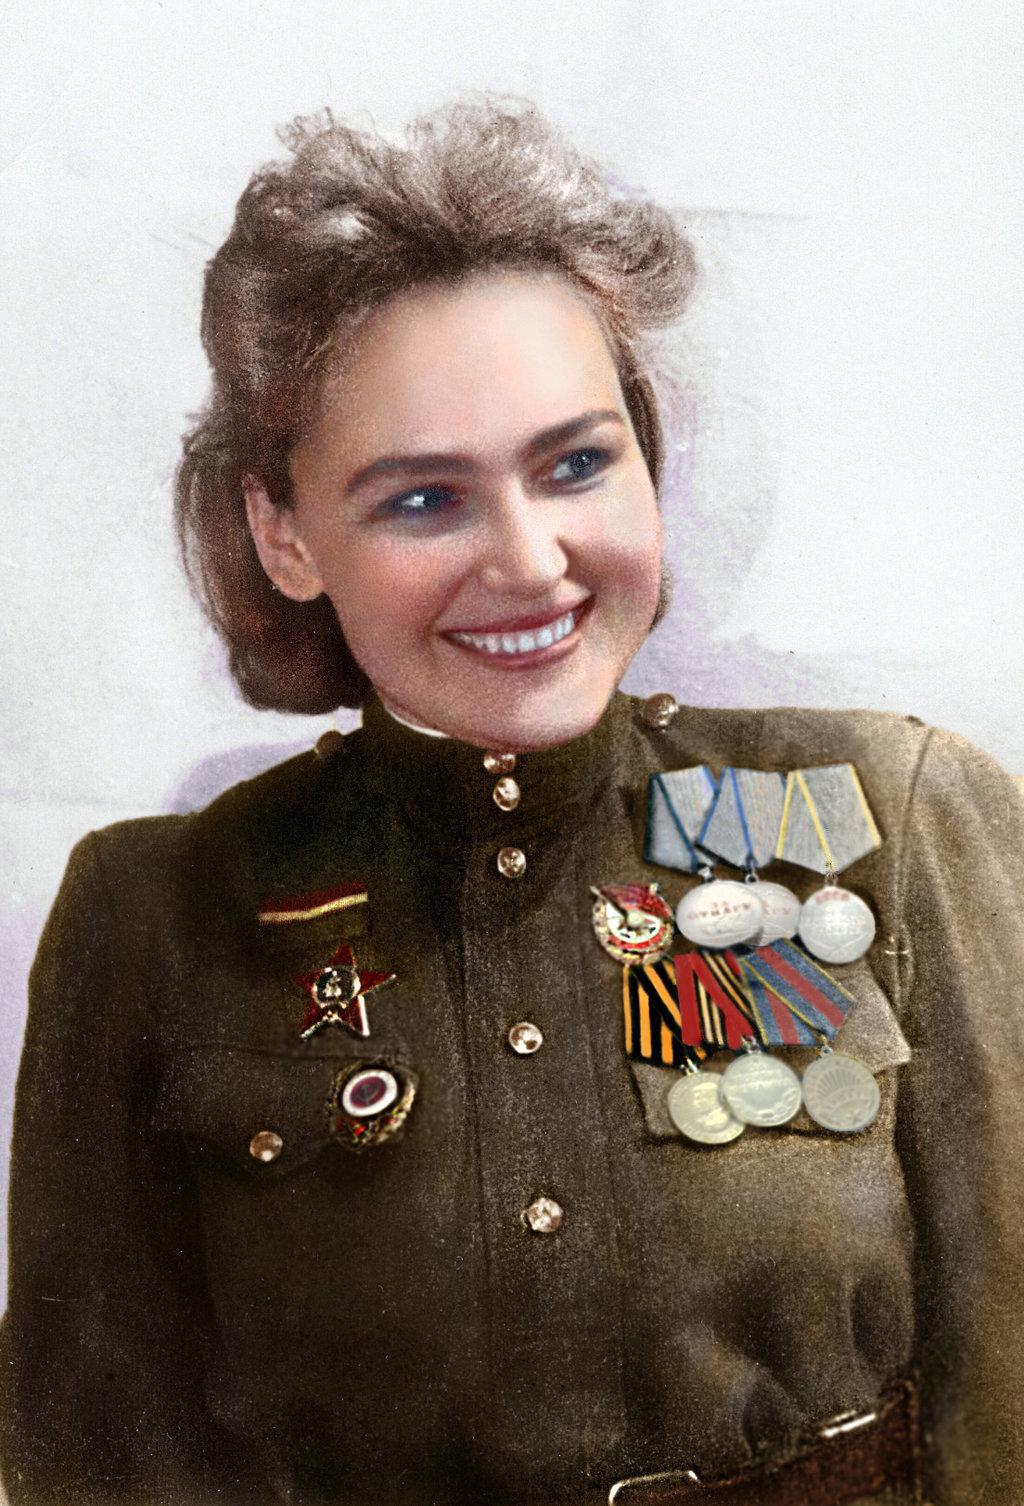 sofia_avericheva__1945_by_klimbims-d8t7ucb.jpg